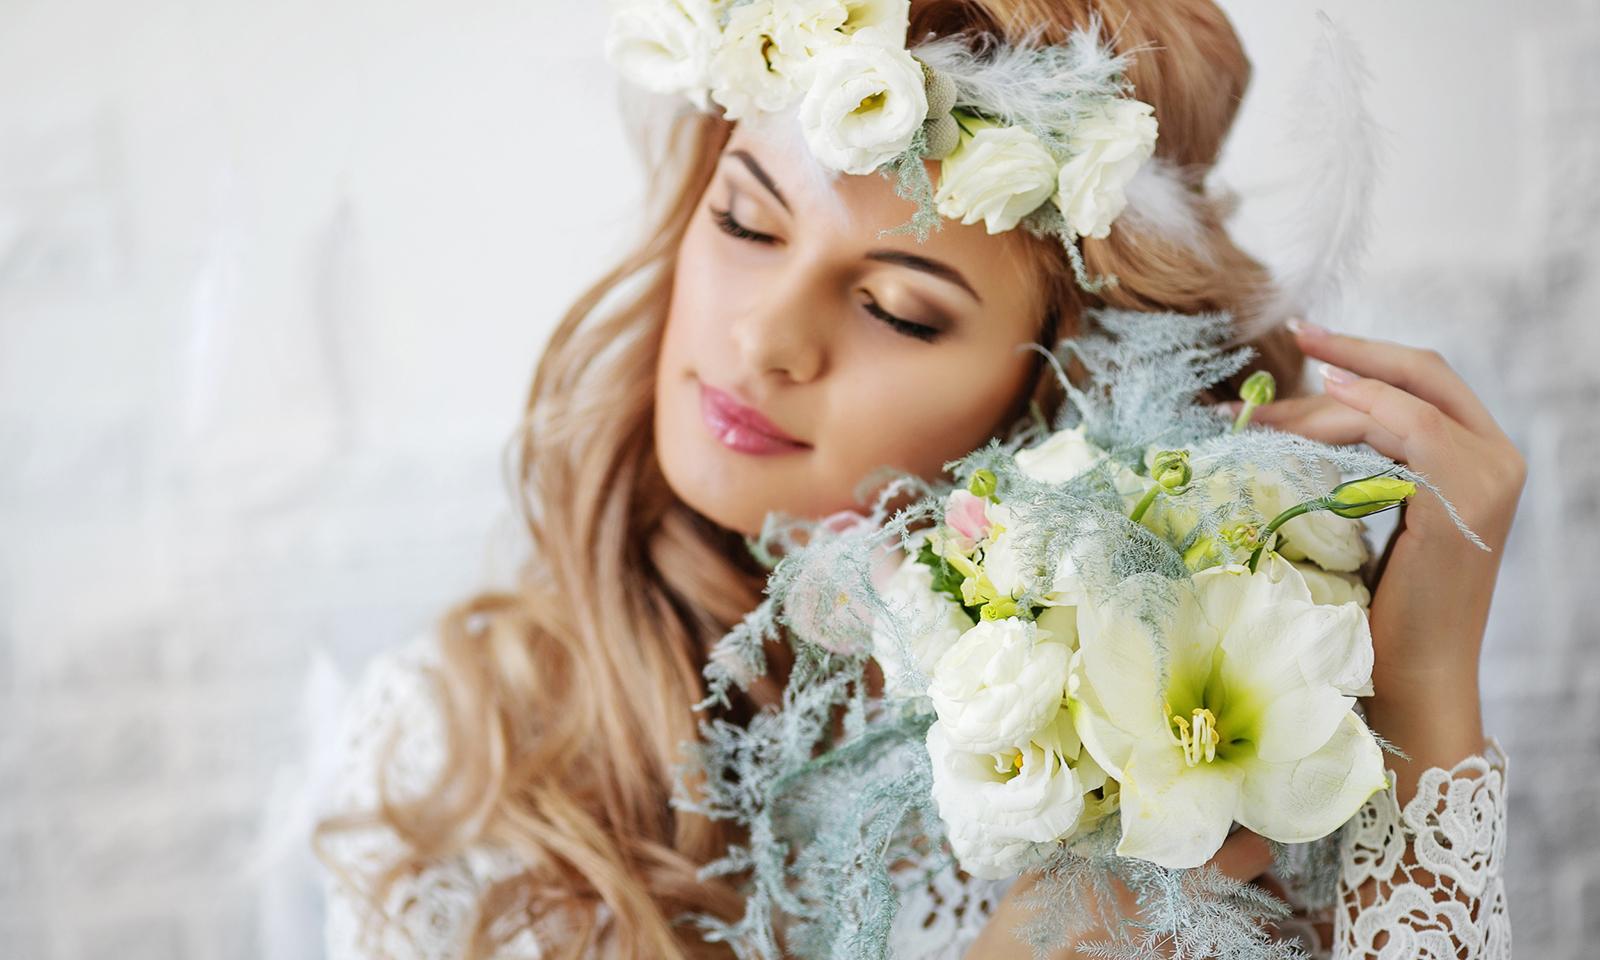 woman-in-white-flower-crown-holding-flowers-beauty-light